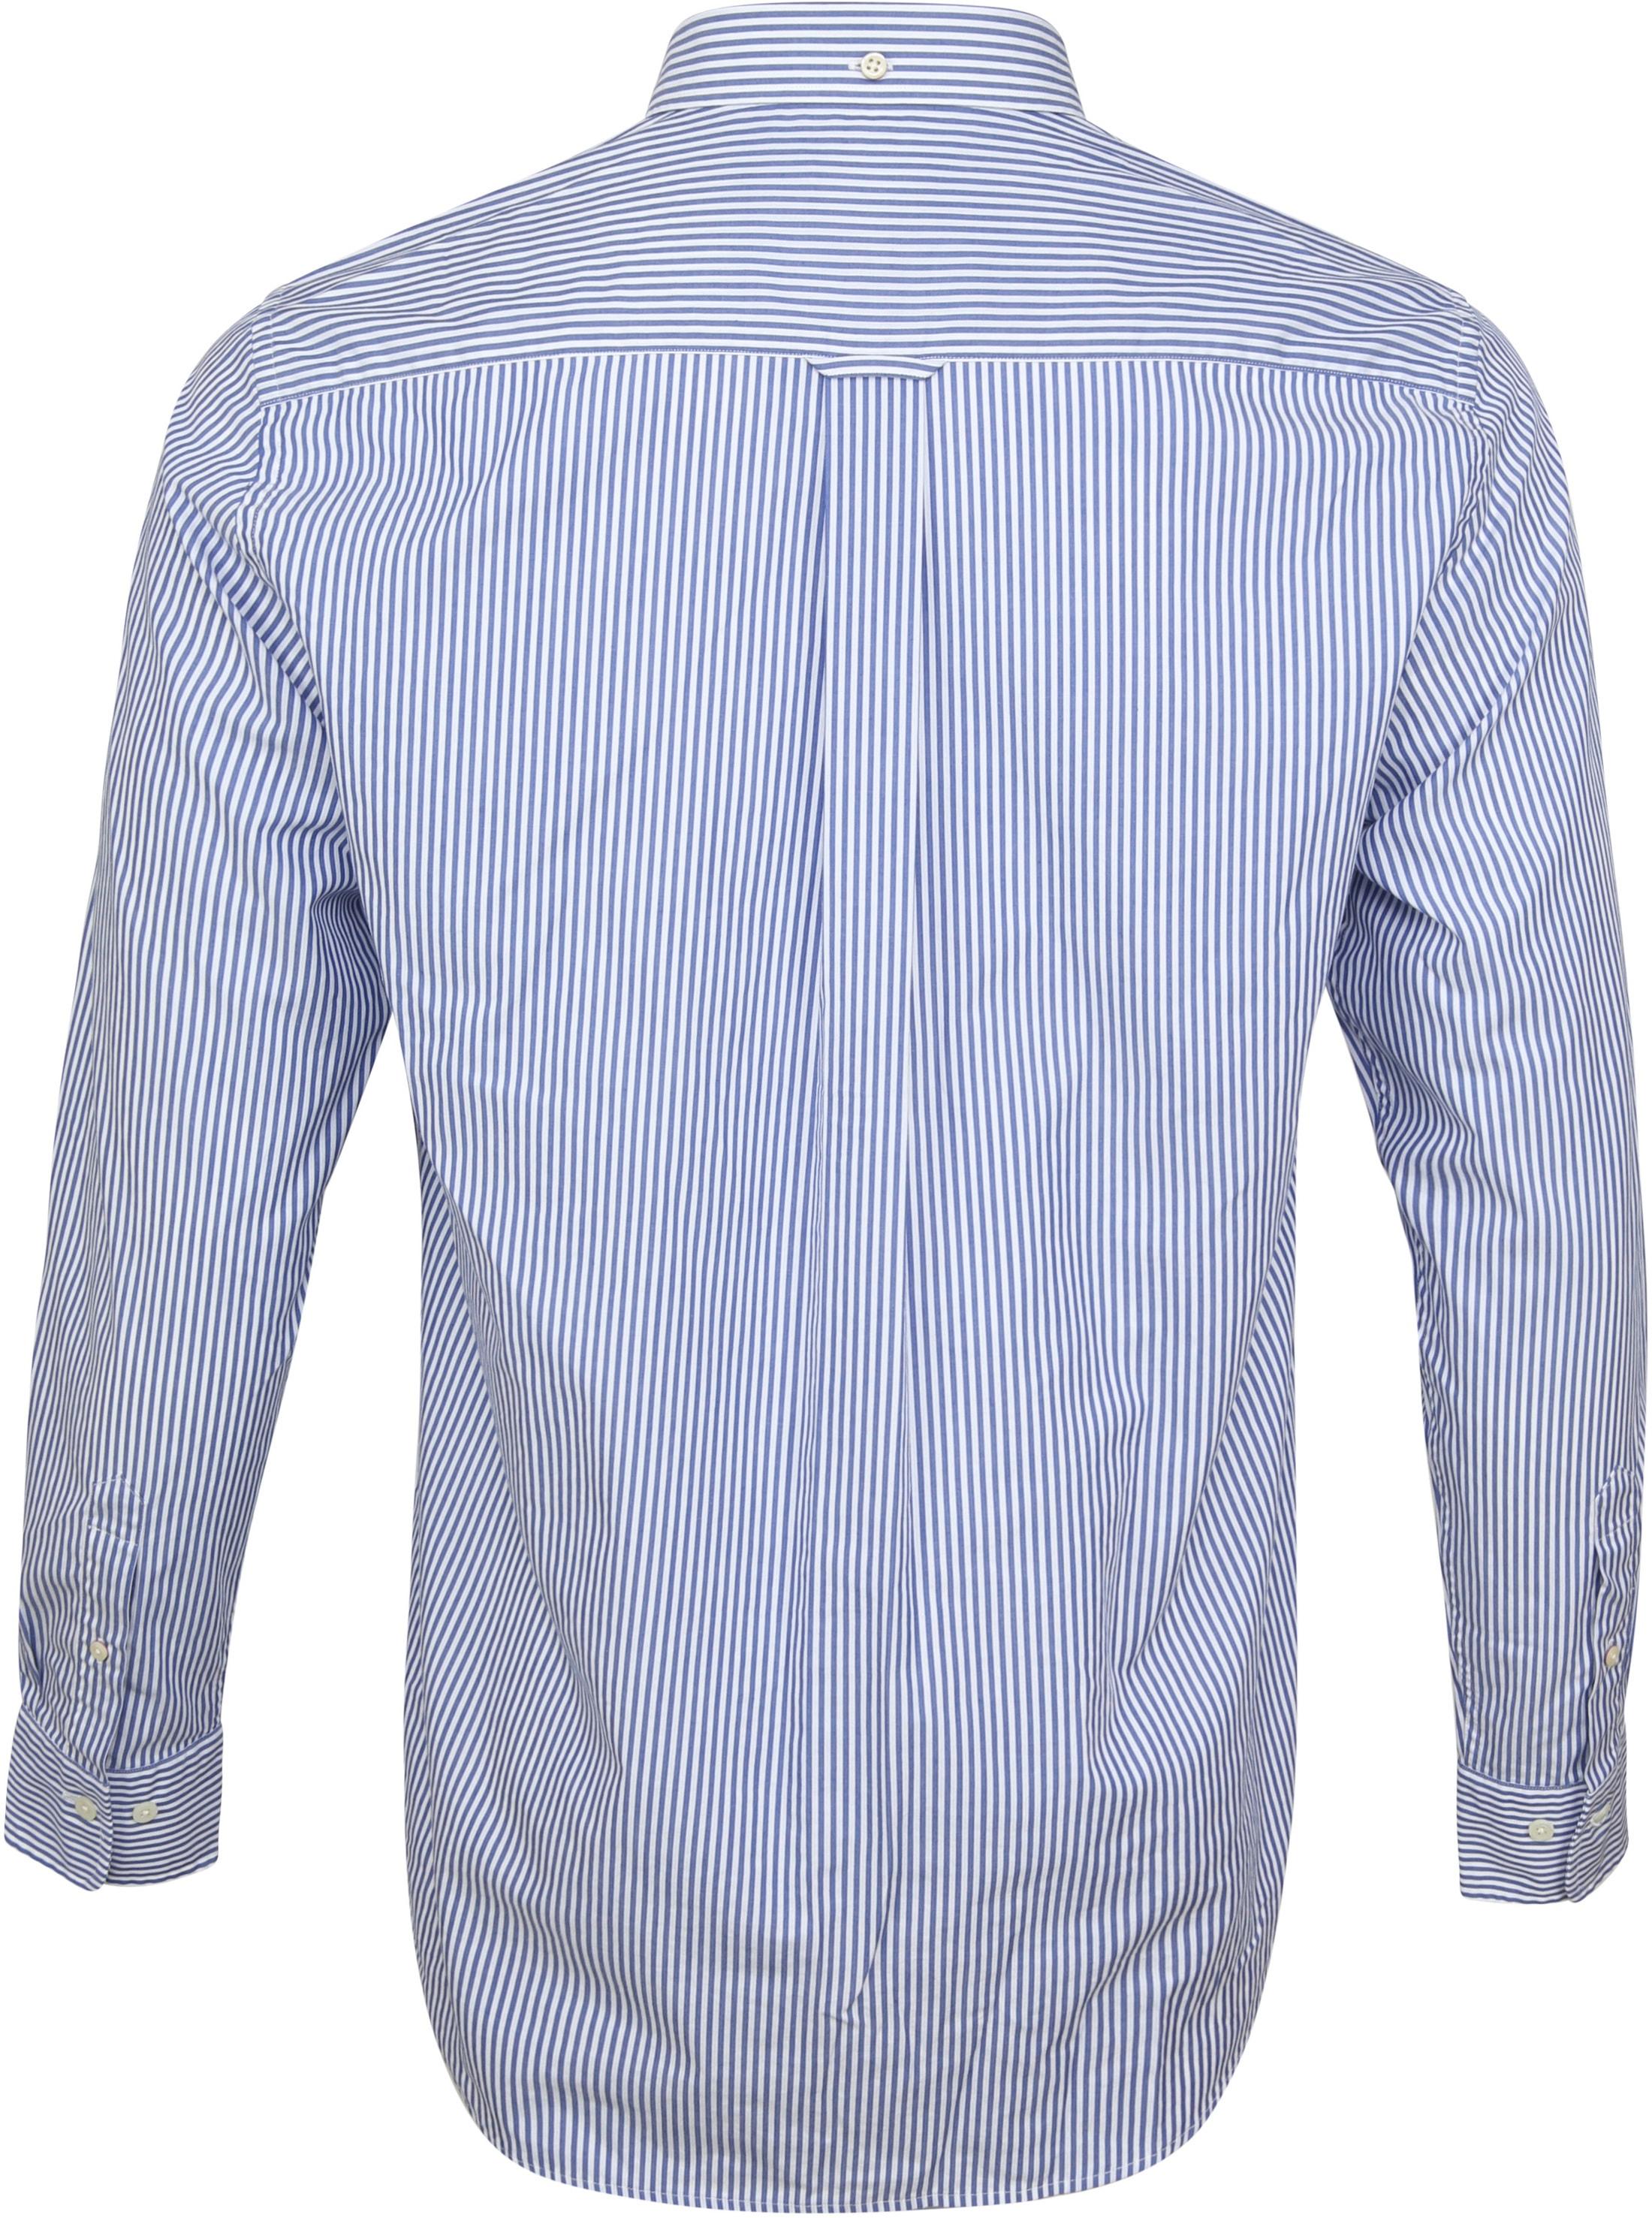 Gant Casual Shirt Stripes Blue foto 3